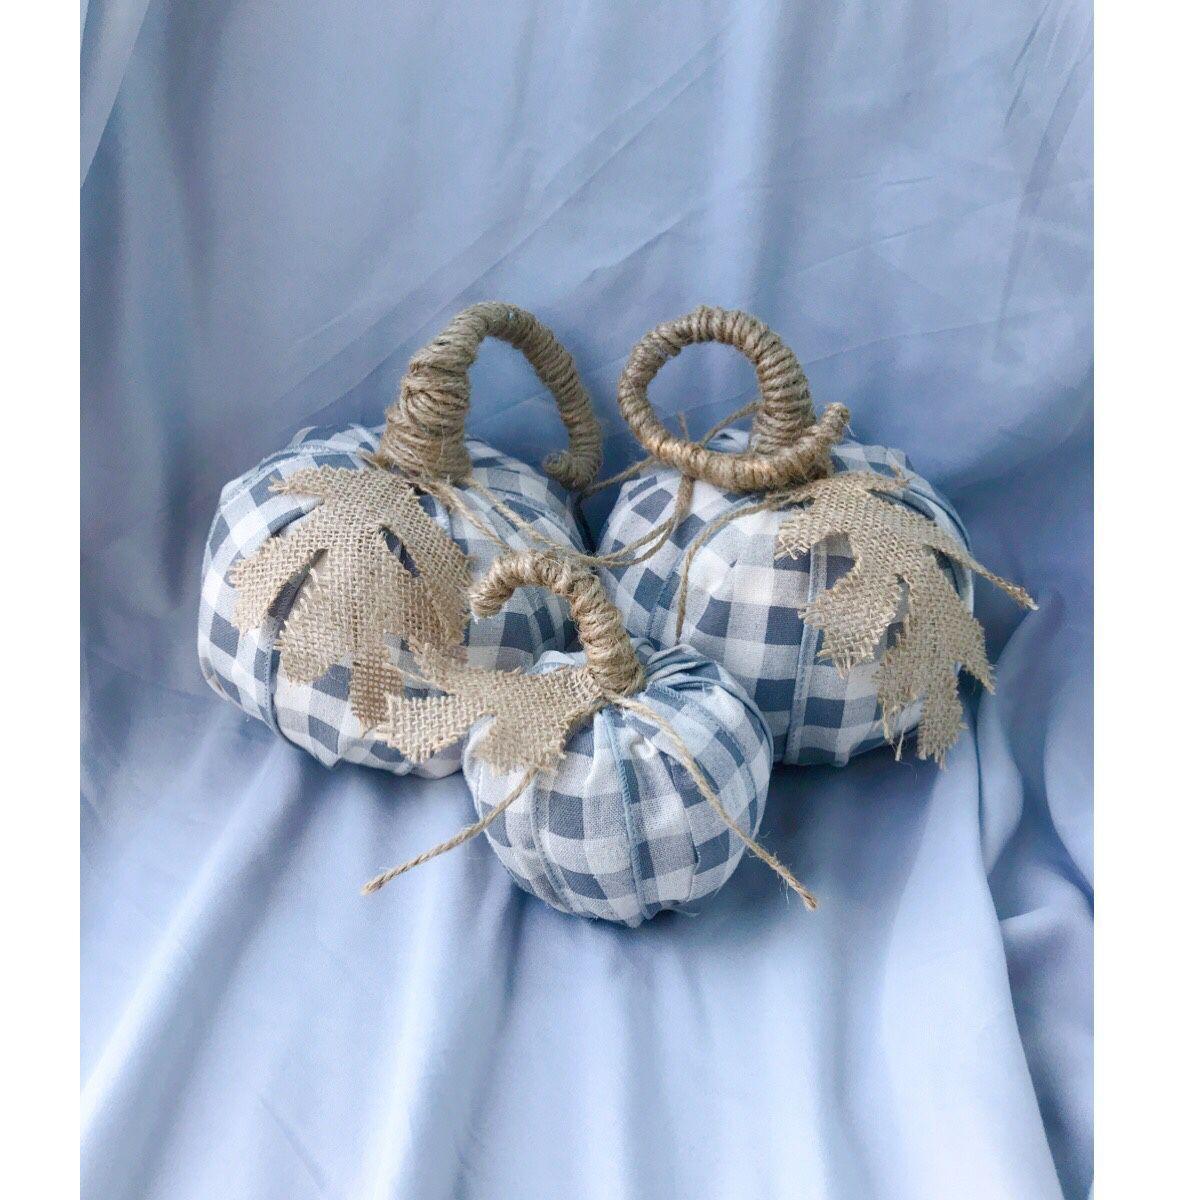 Handmade Sweater Ribbon Pumpkins Fall Halloween Decorations Custom Orders